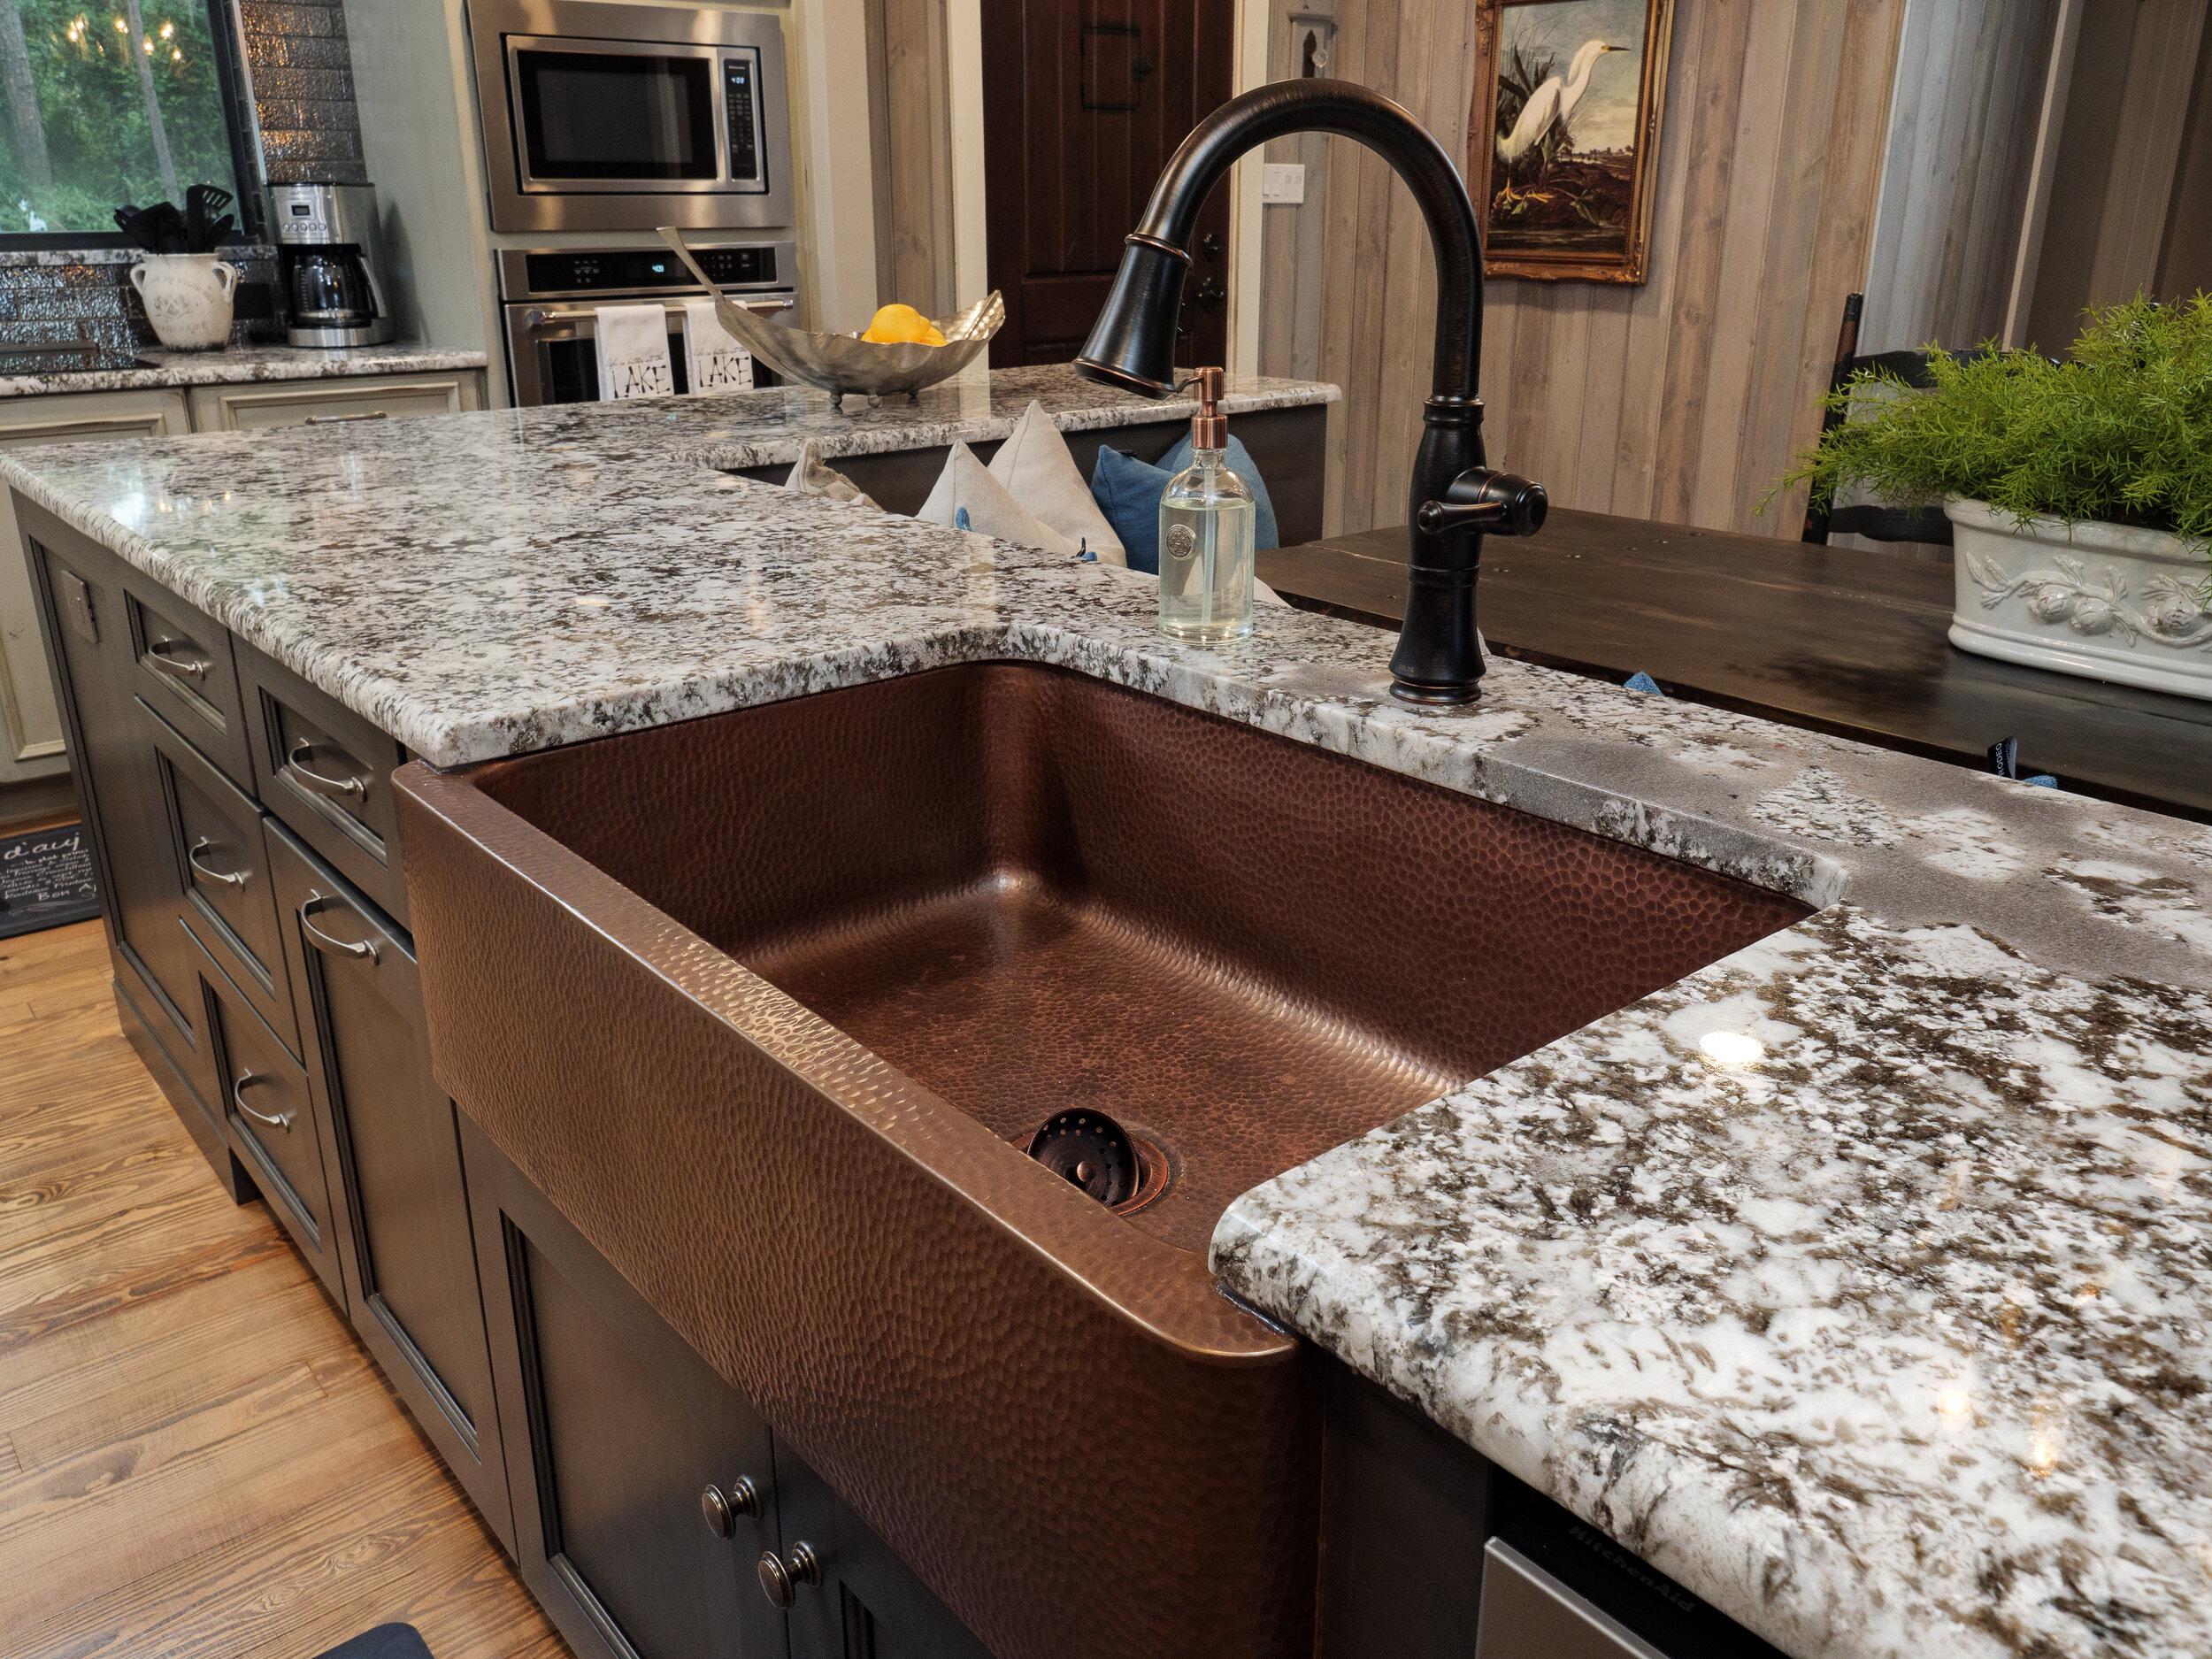 Buffkin kitchen sink and faucet.jpg